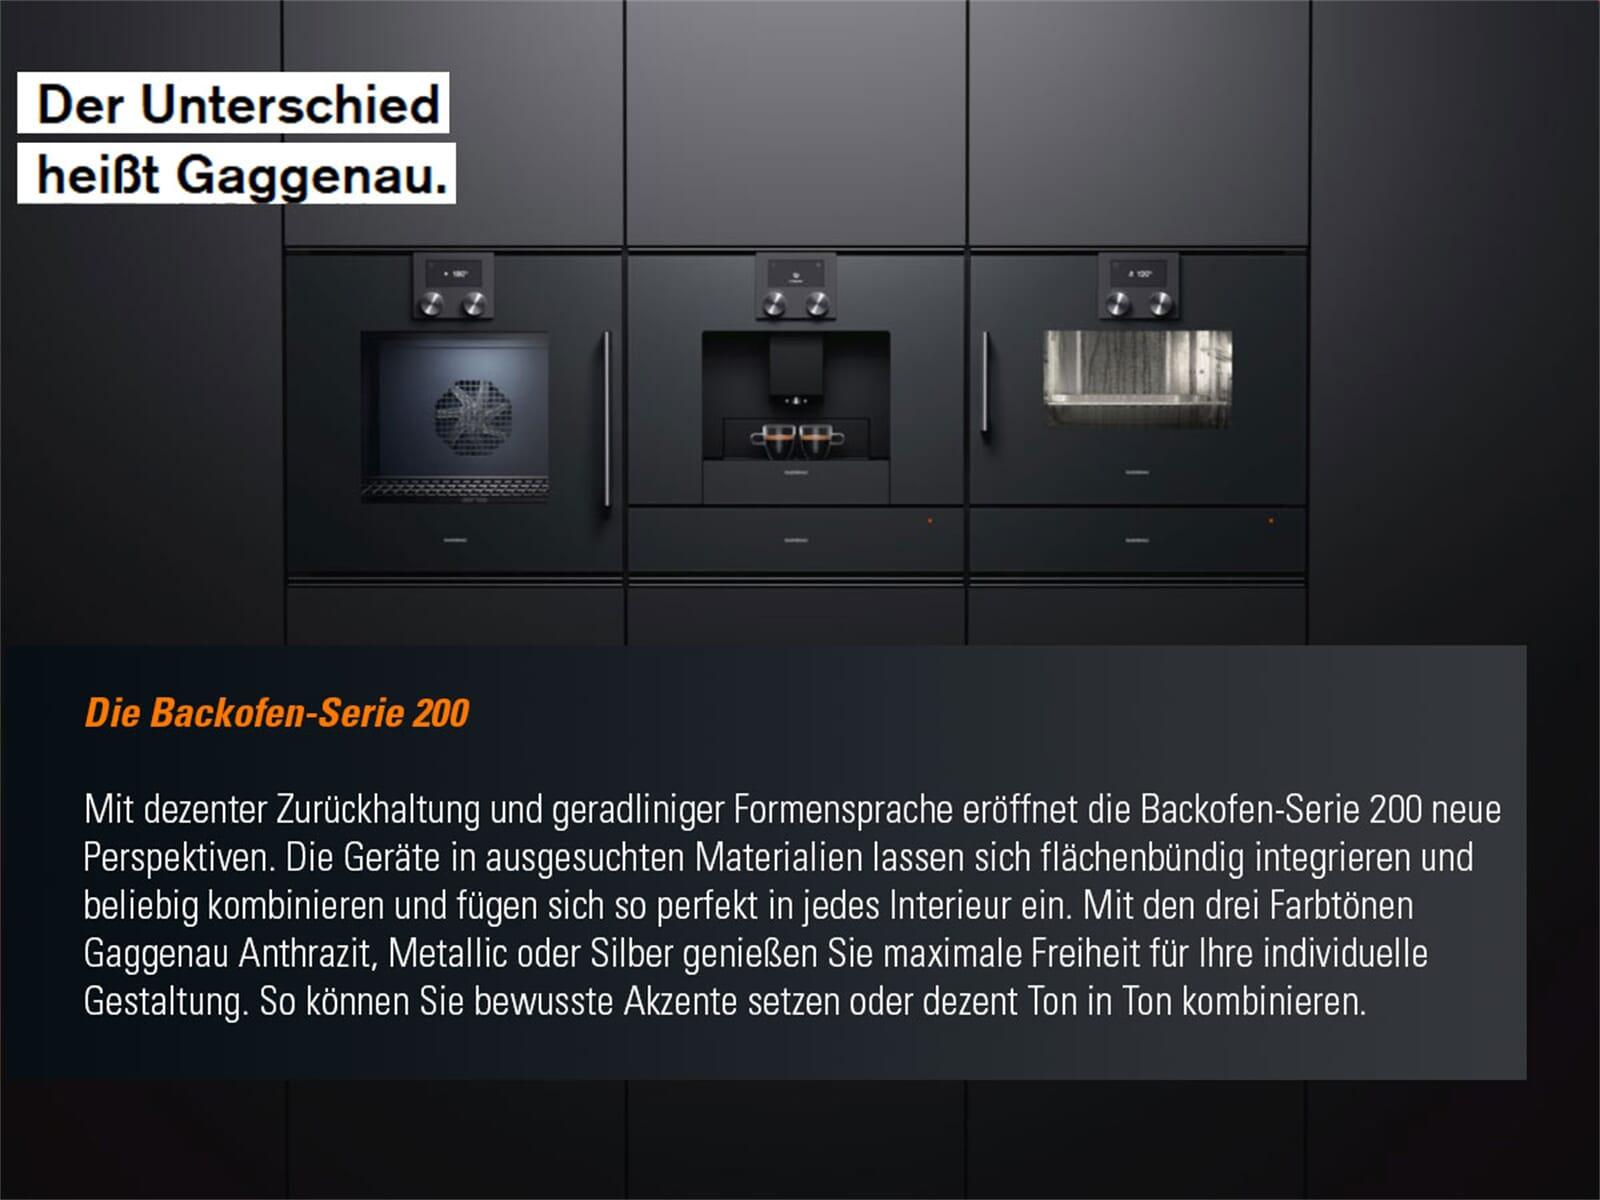 Gaggenau BOP 221 101 Backofen Serie 200 Anthrazit